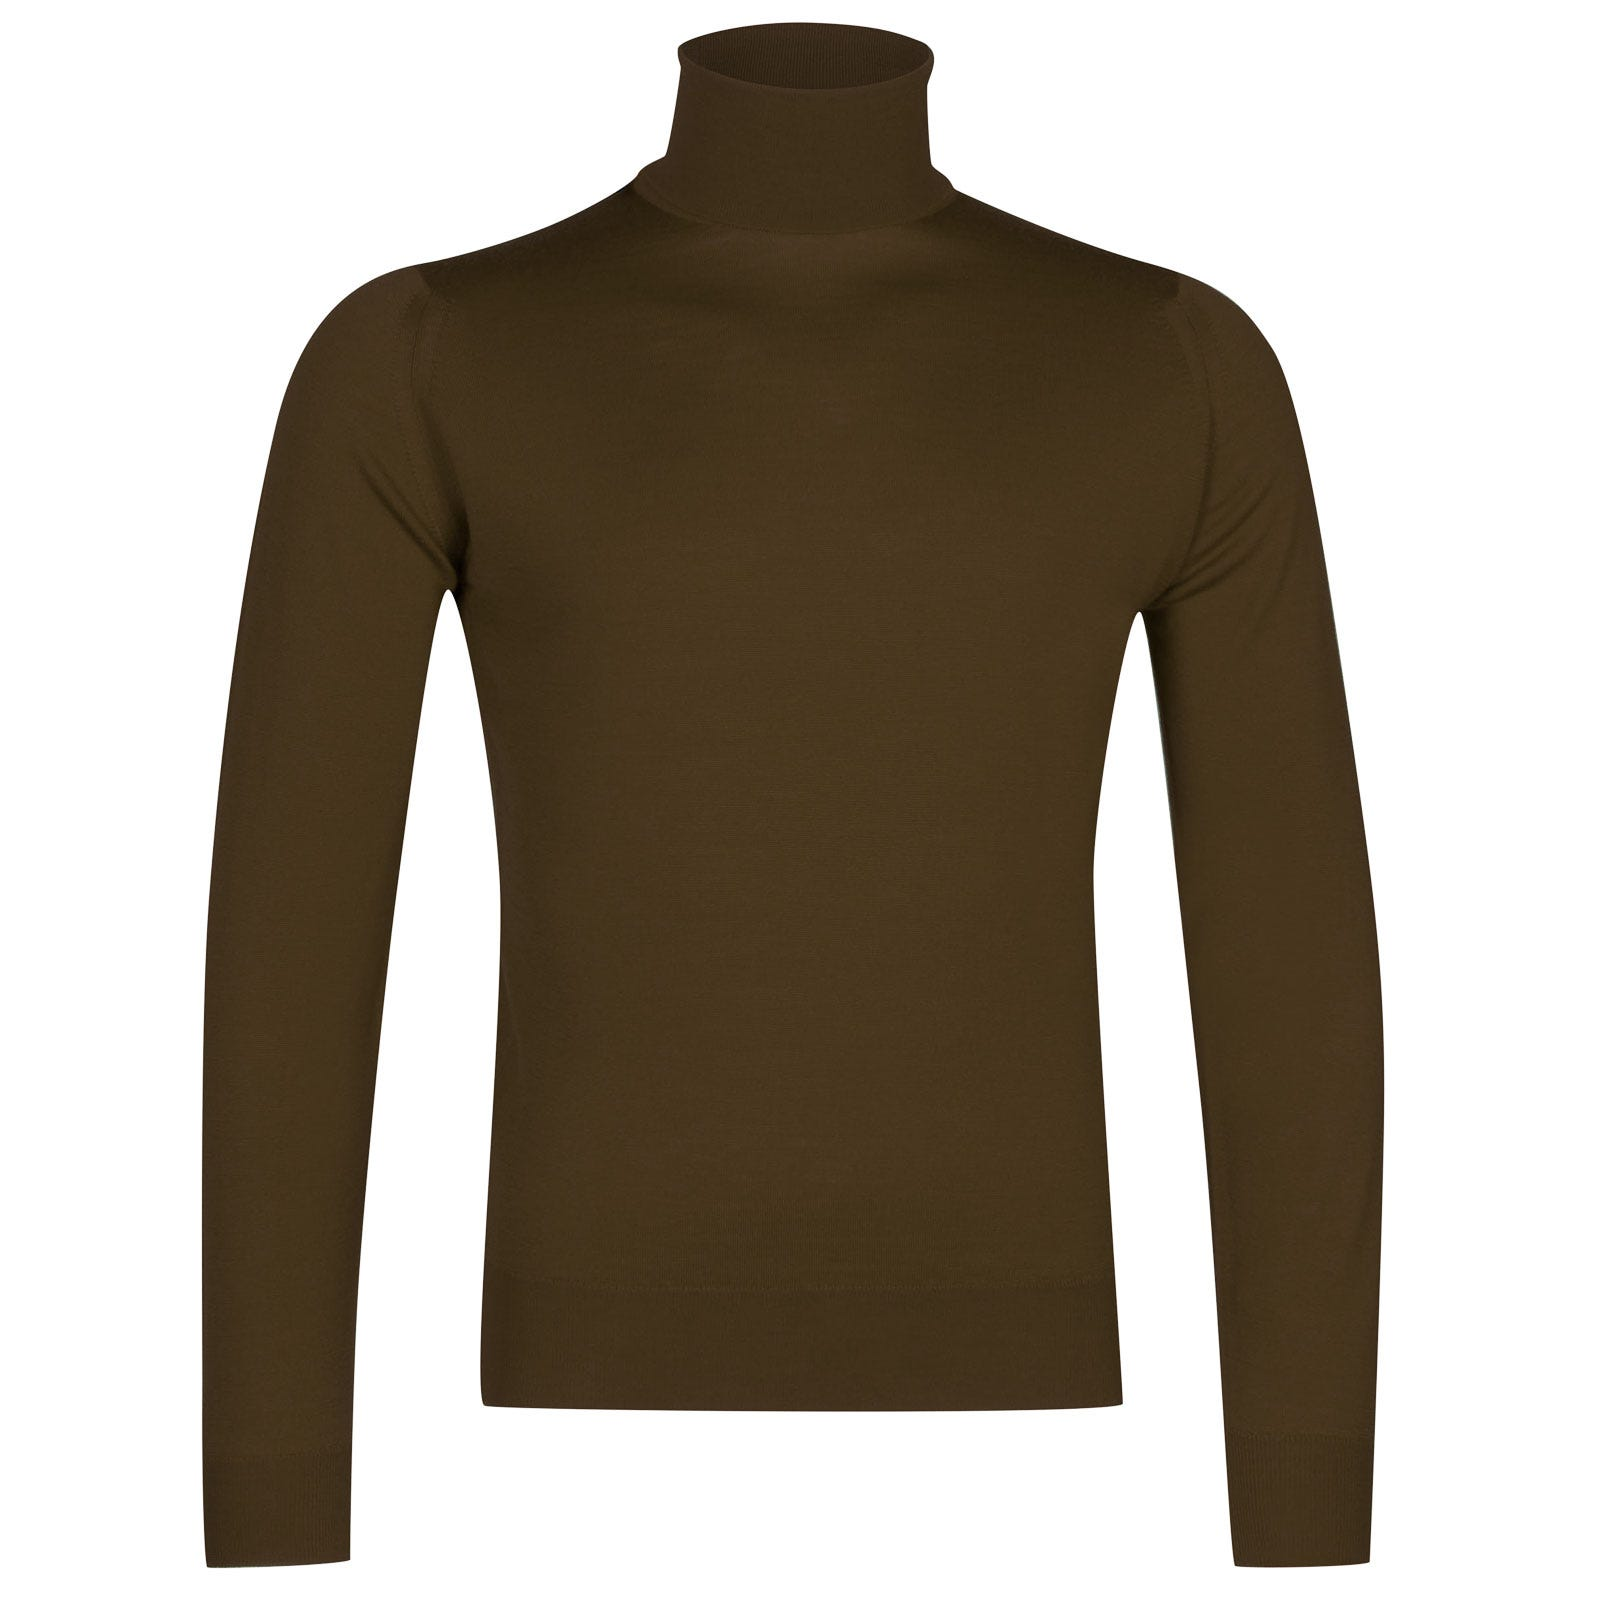 John Smedley Orta Merino Wool Pullover in Kielder Green-XXL